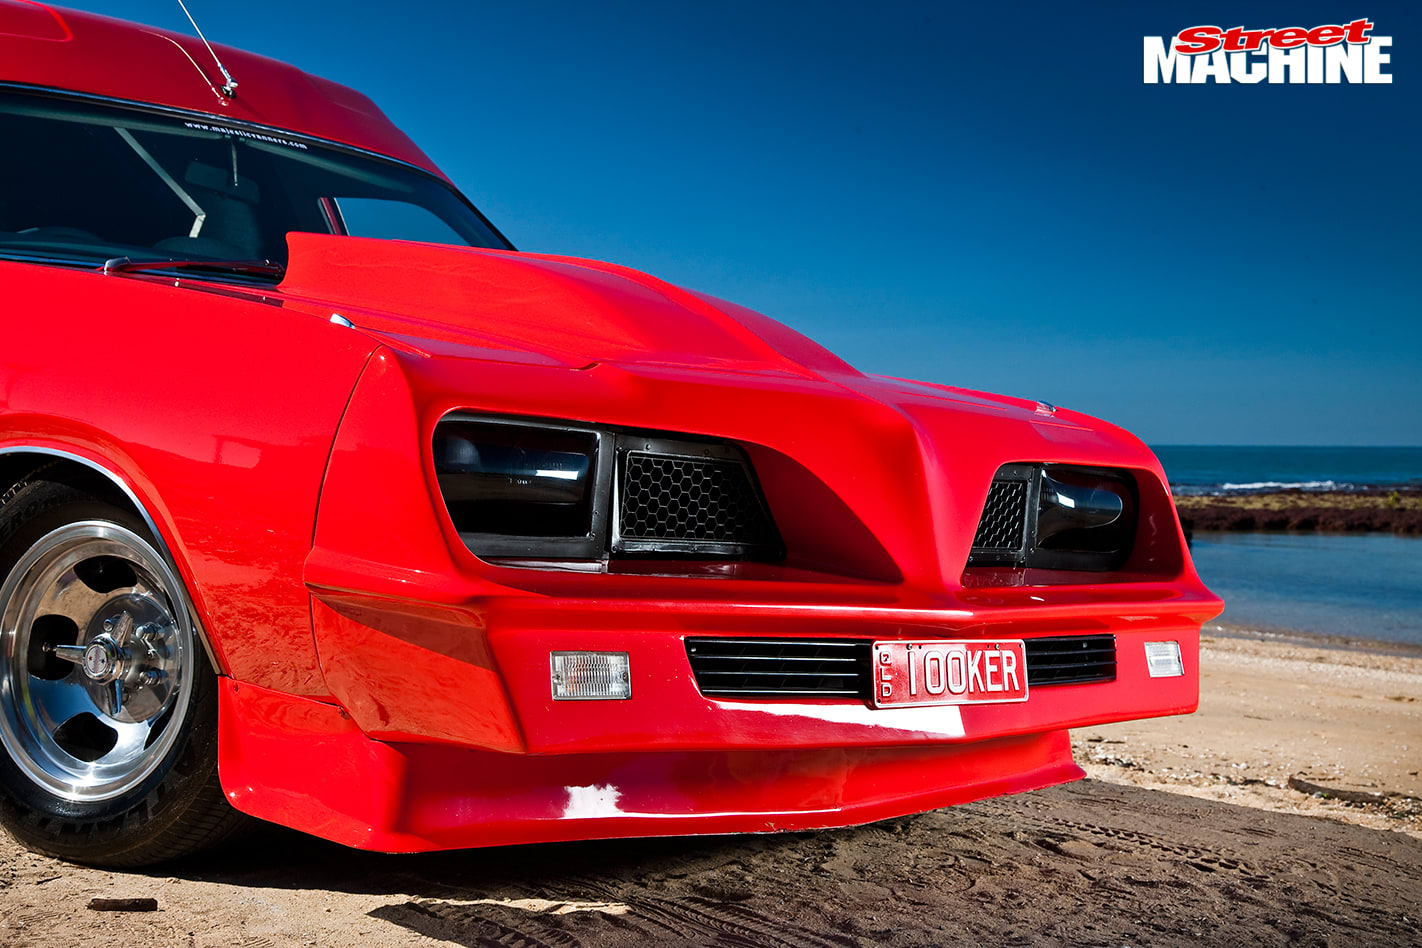 Chrysler -panel -van -front